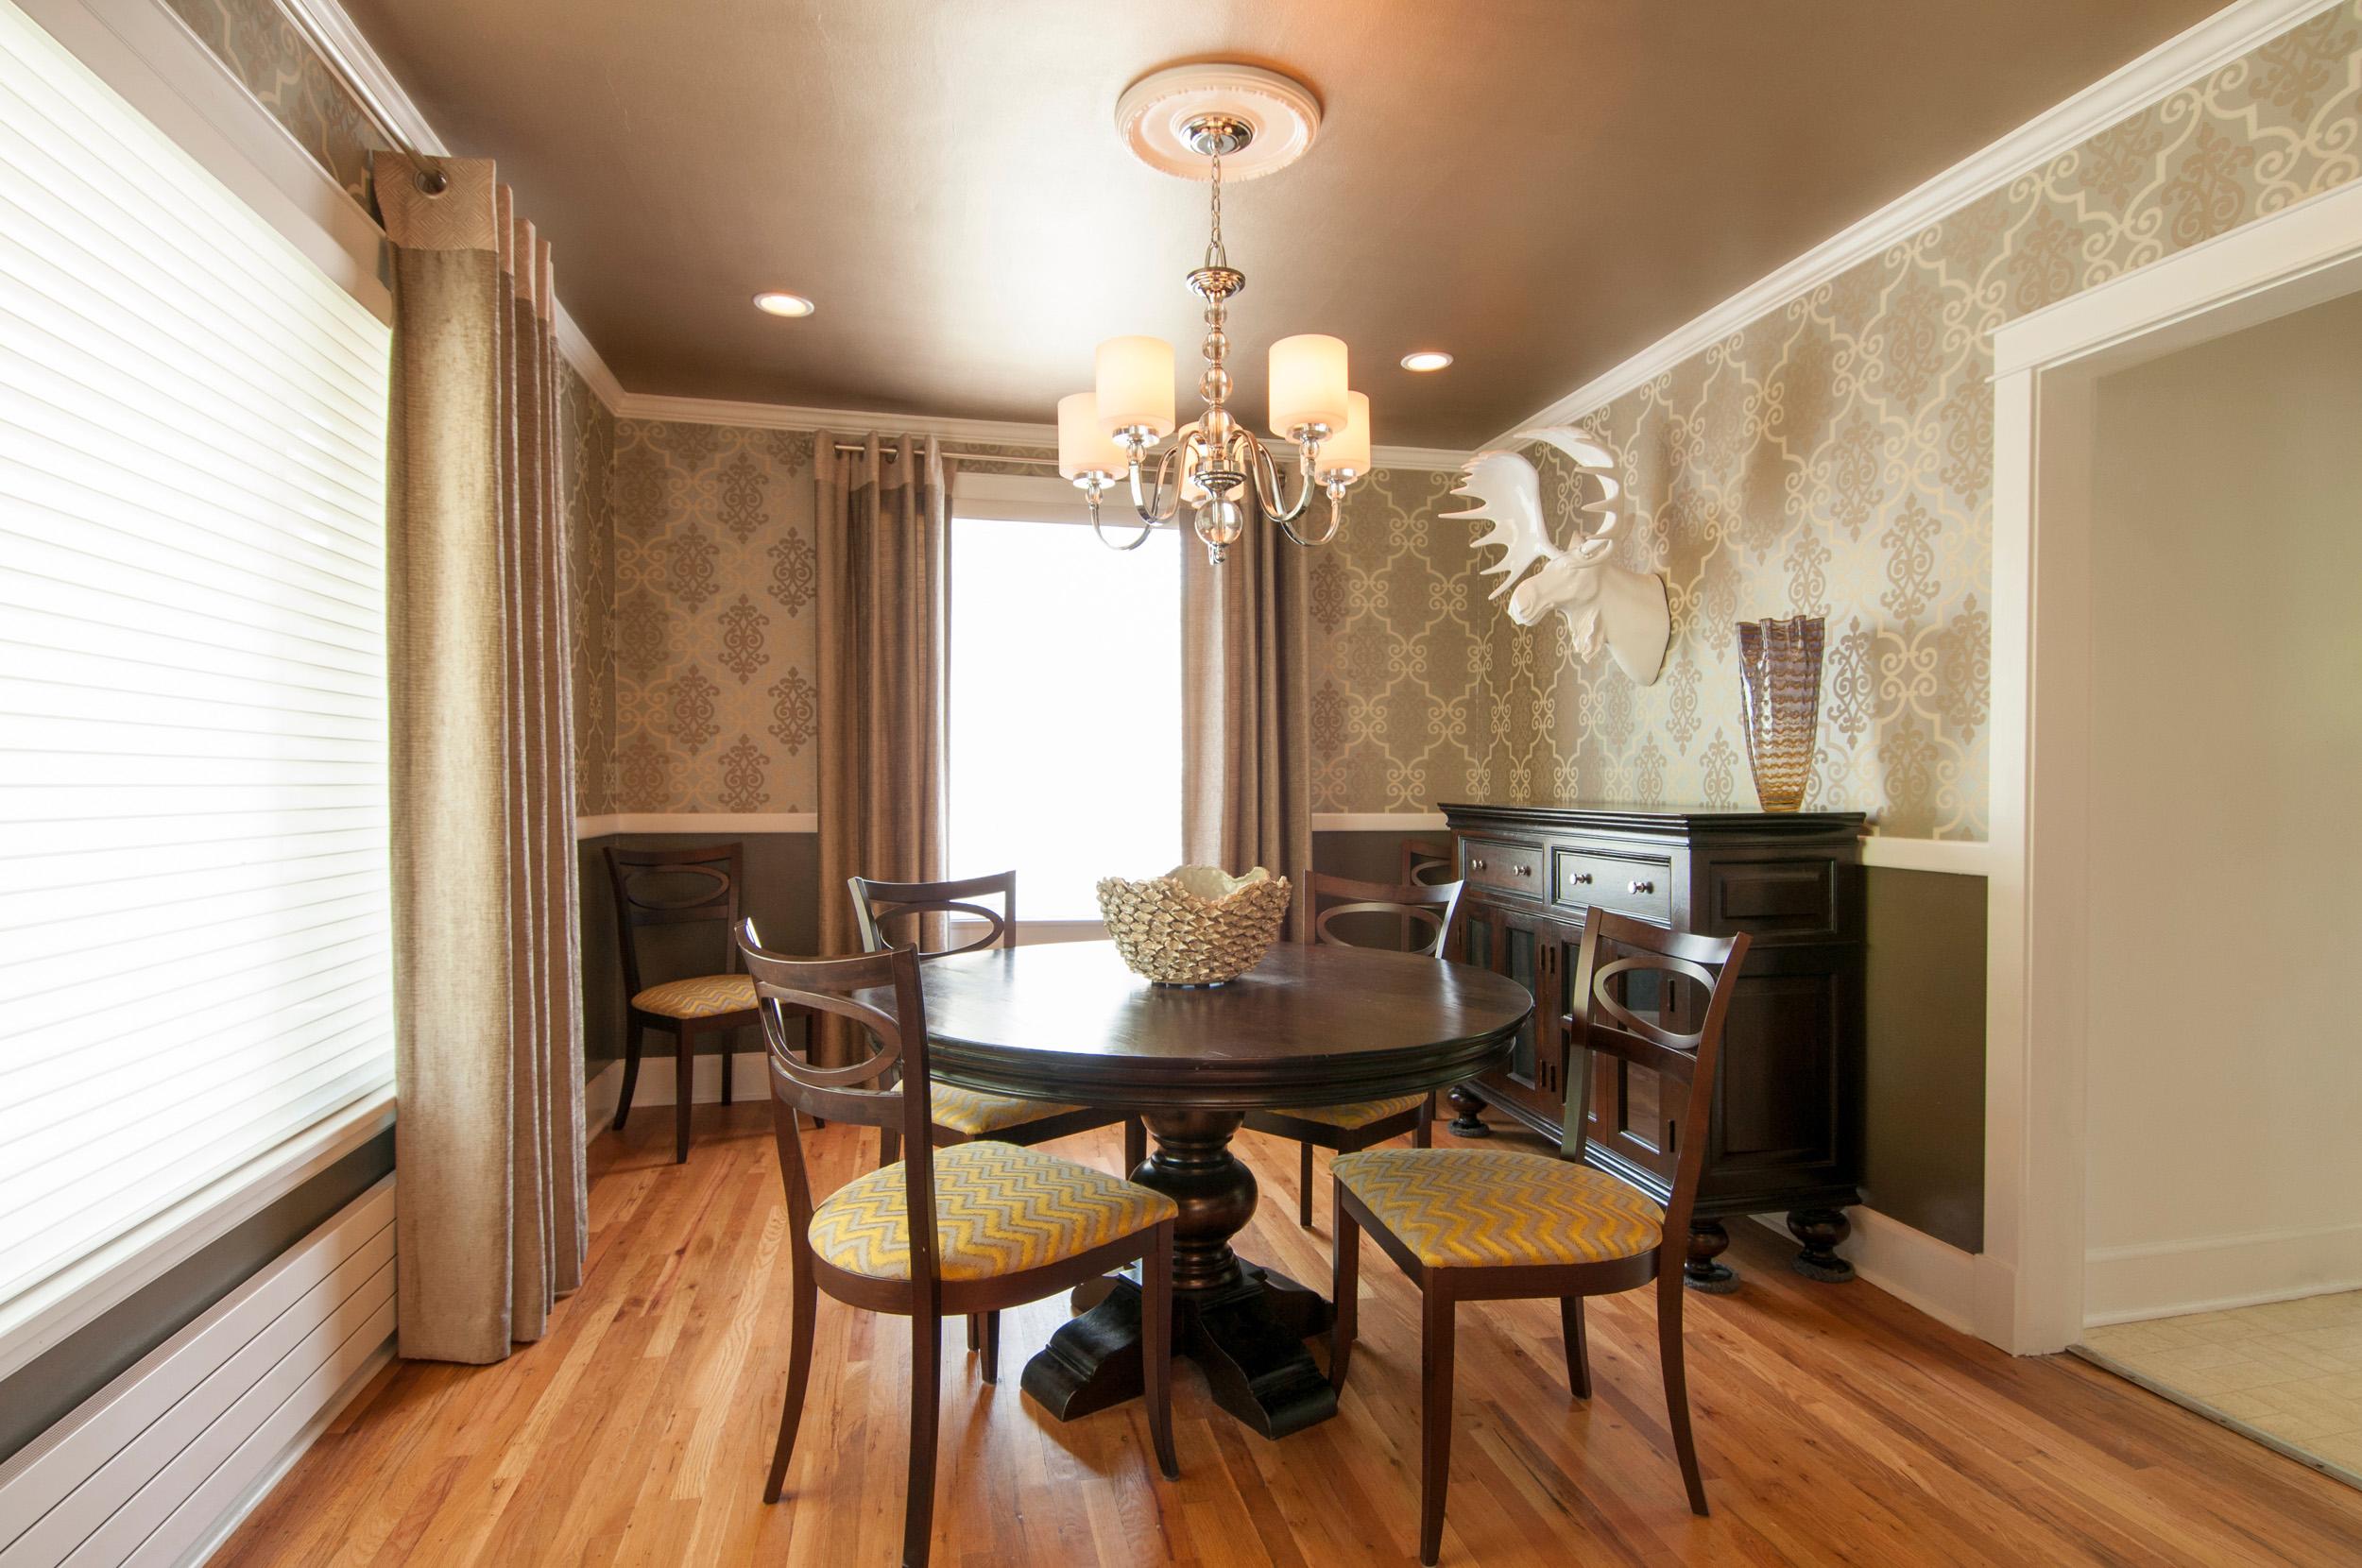 Britt_Nemeth_Photography_Real_Estate_Commercial_Architectural028.jpg